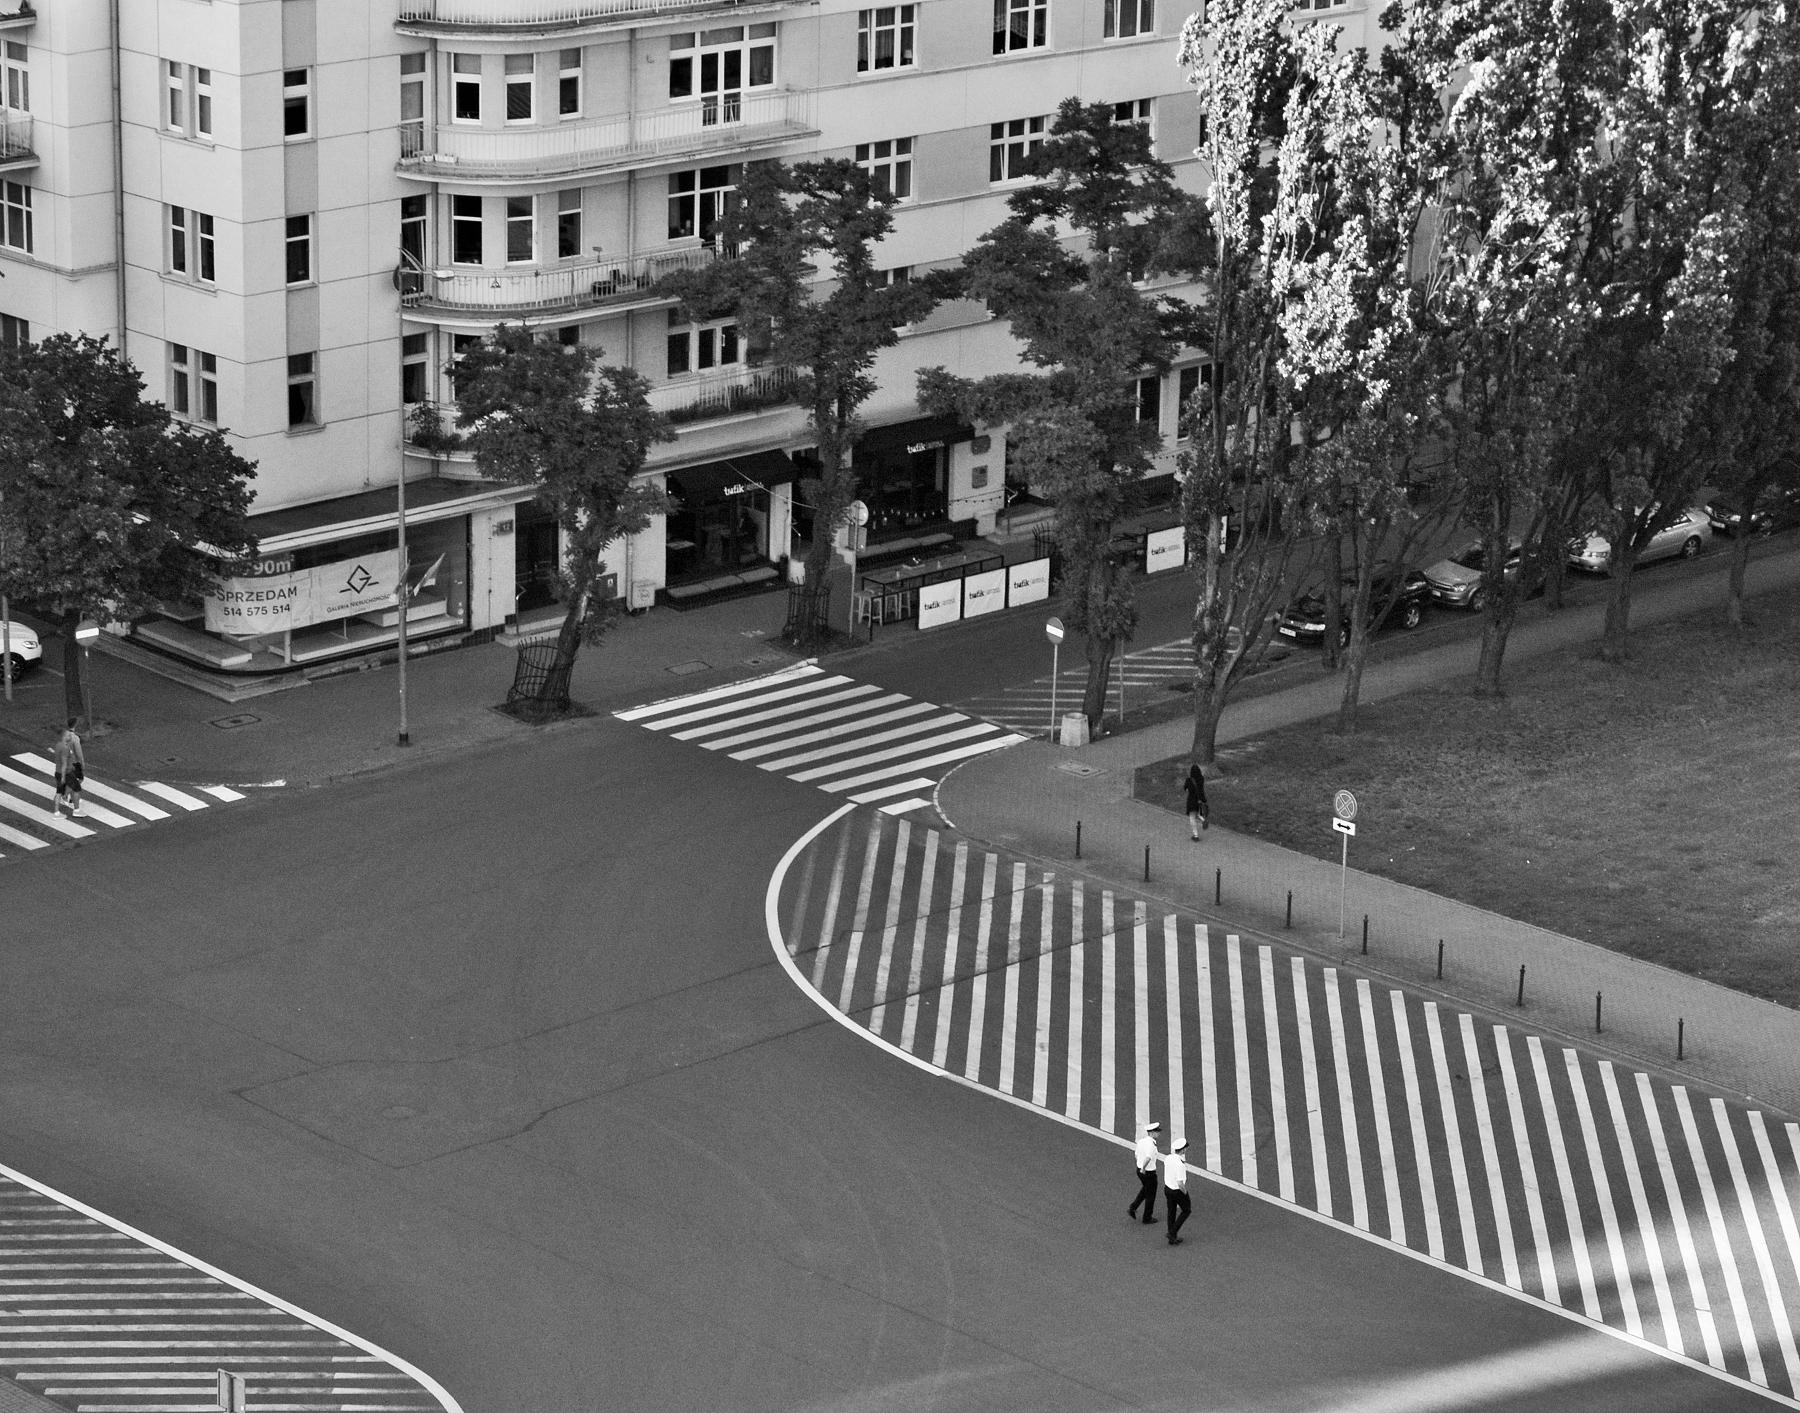 fot. Jakub Kujawa, kat. Architektura i życie miasta